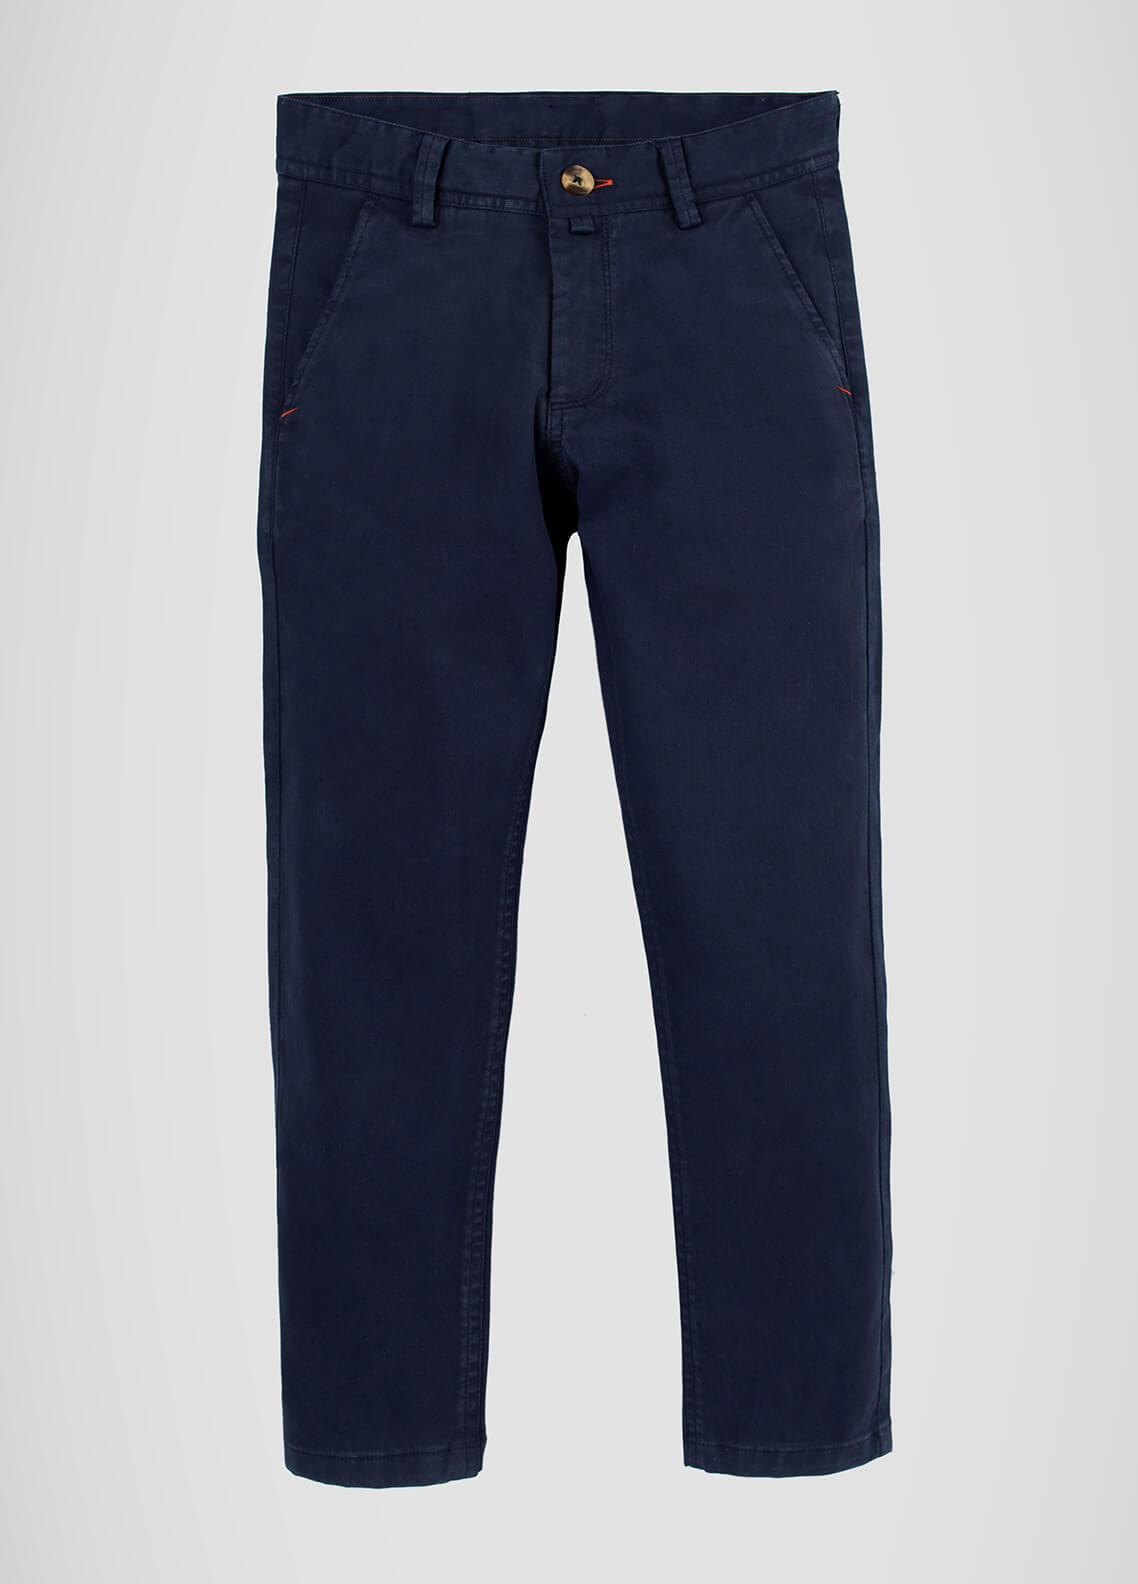 Brumano Cotton Casual Boys Trousers -  BRM-555-Grey